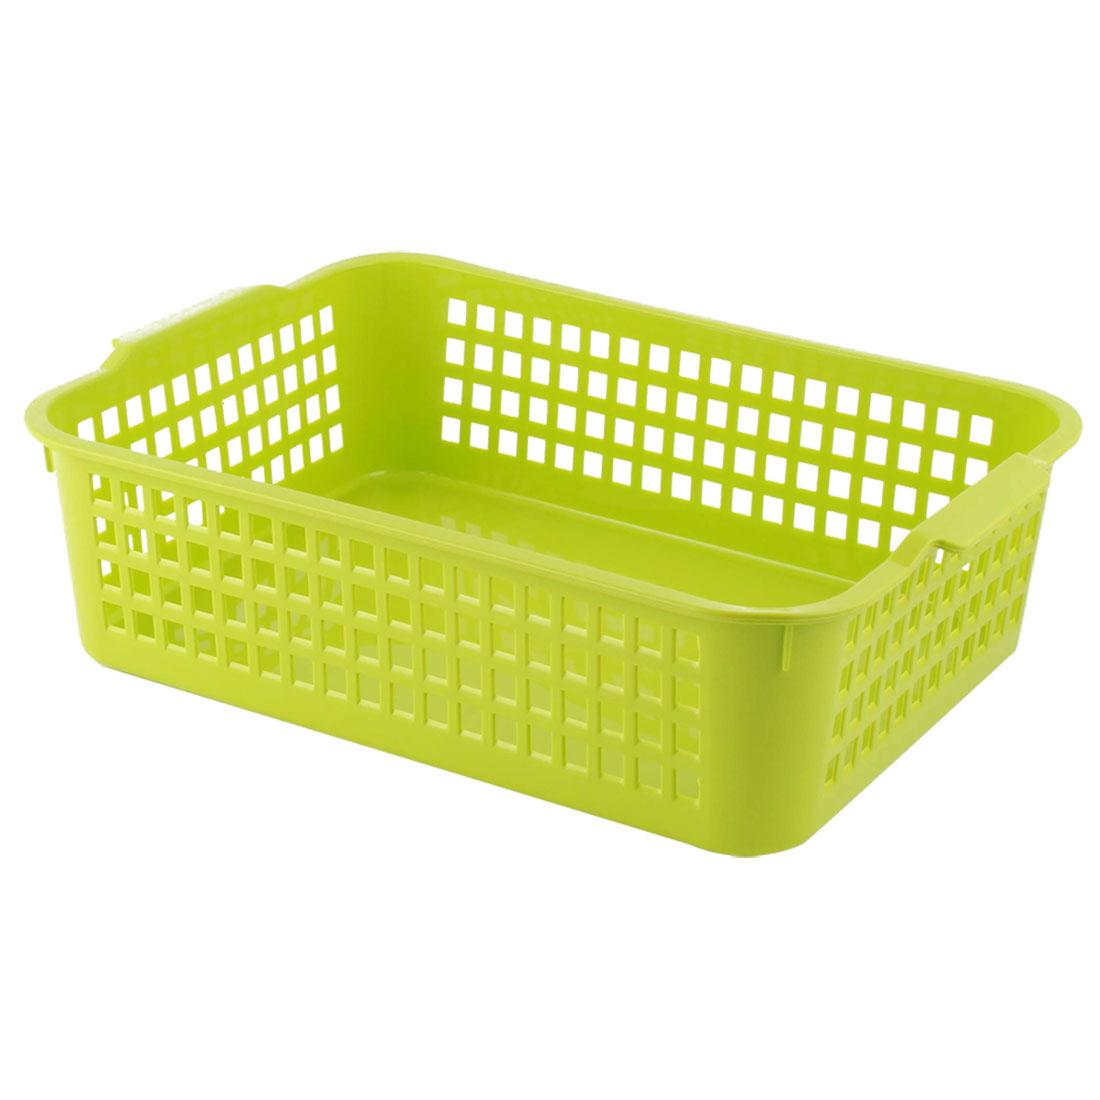 Office Plastic Books Document File Classification Storage Organizer Basket Green